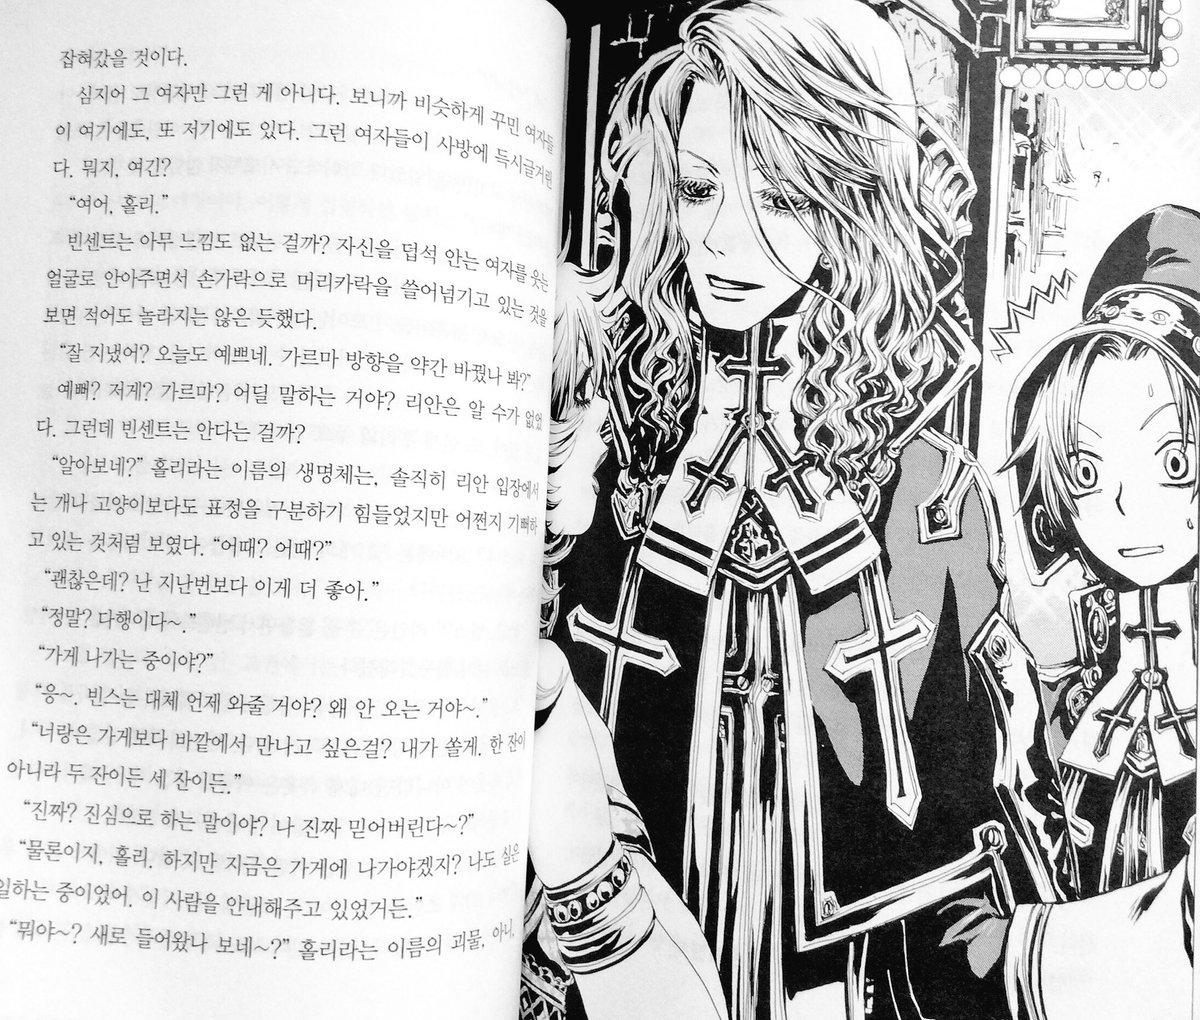 Images of ライトノベルの挿絵画家一覧 - JapaneseClass.jp